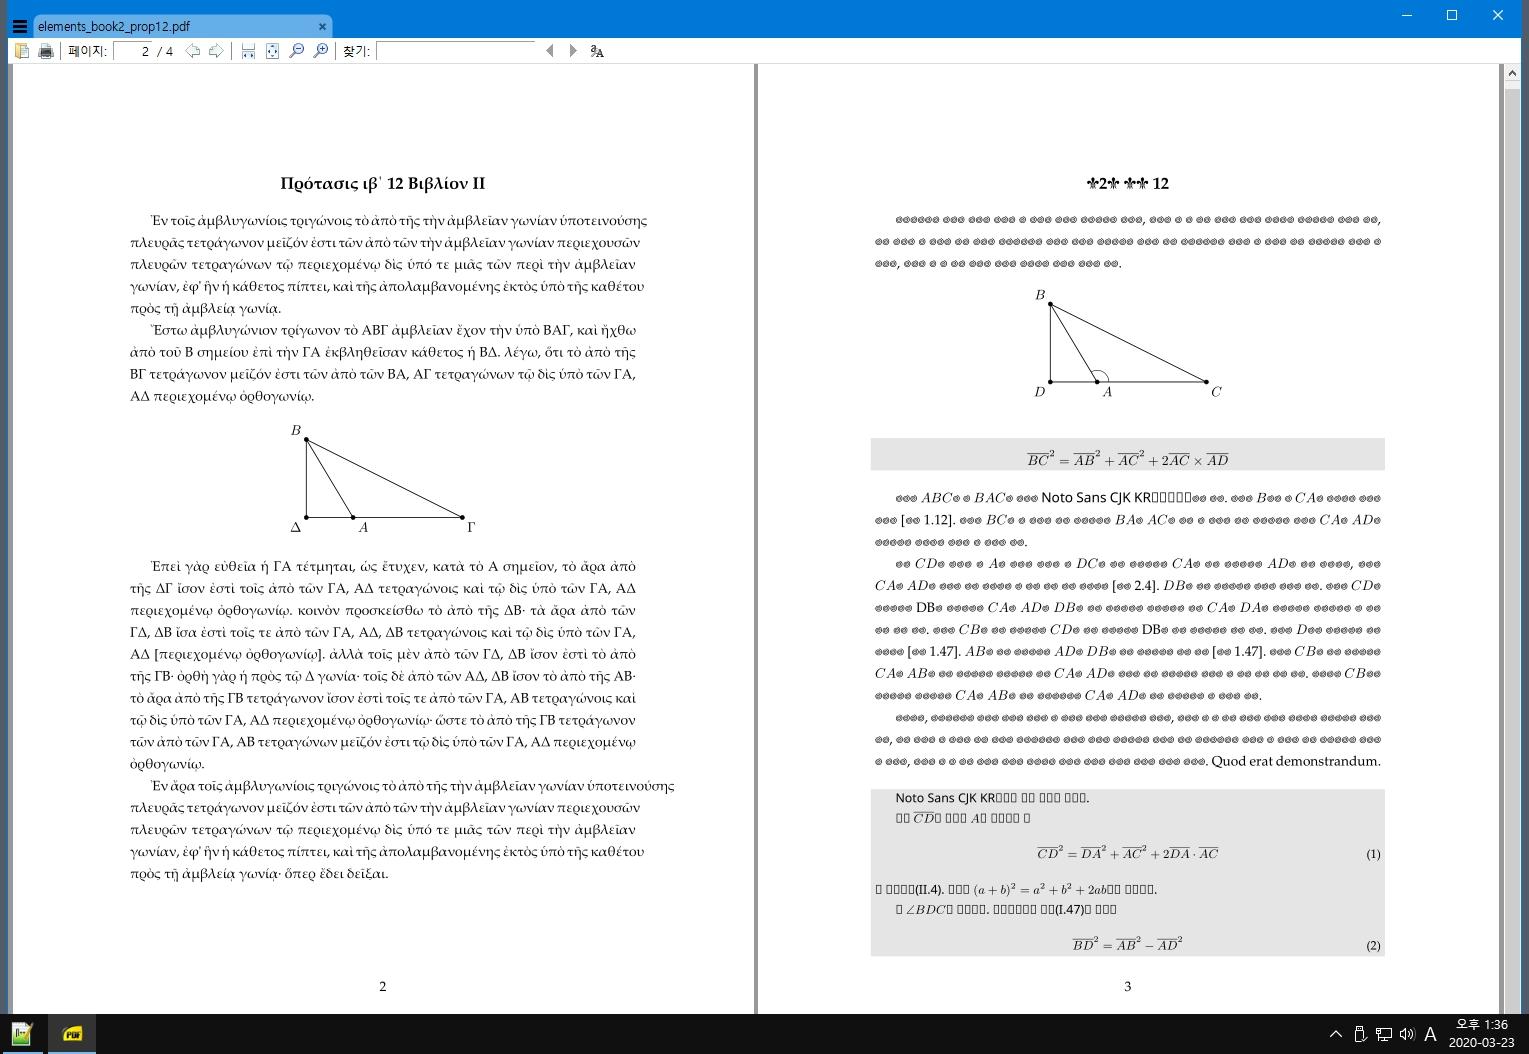 polyglossia_test.jpg